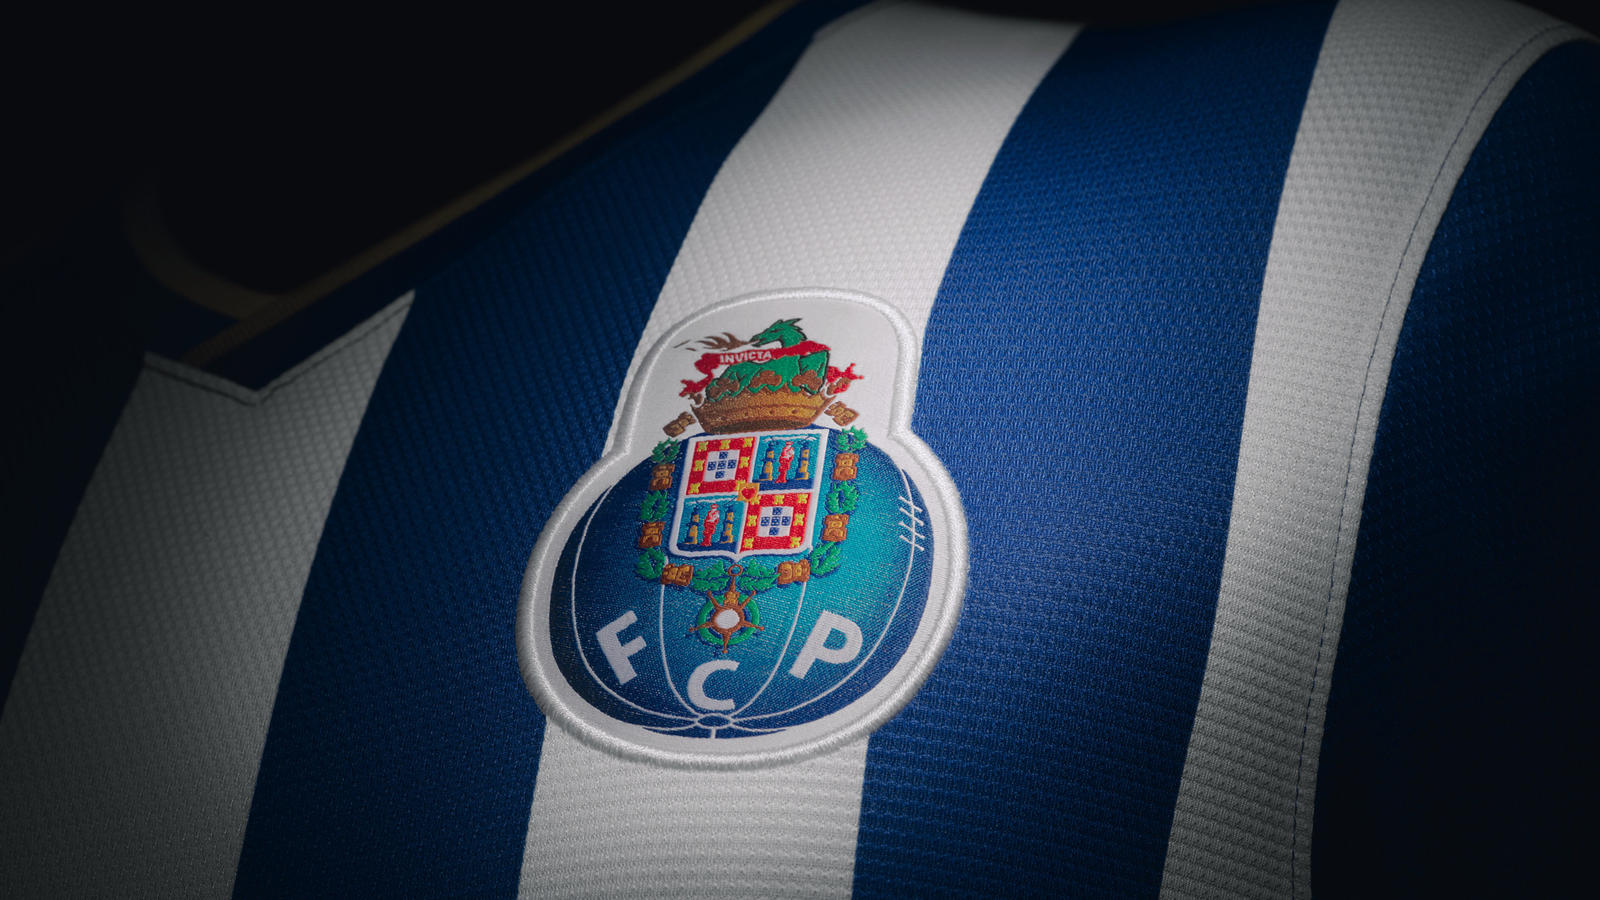 FC Porto Wallpaper 17   1600 X 900 stmednet 1600x900